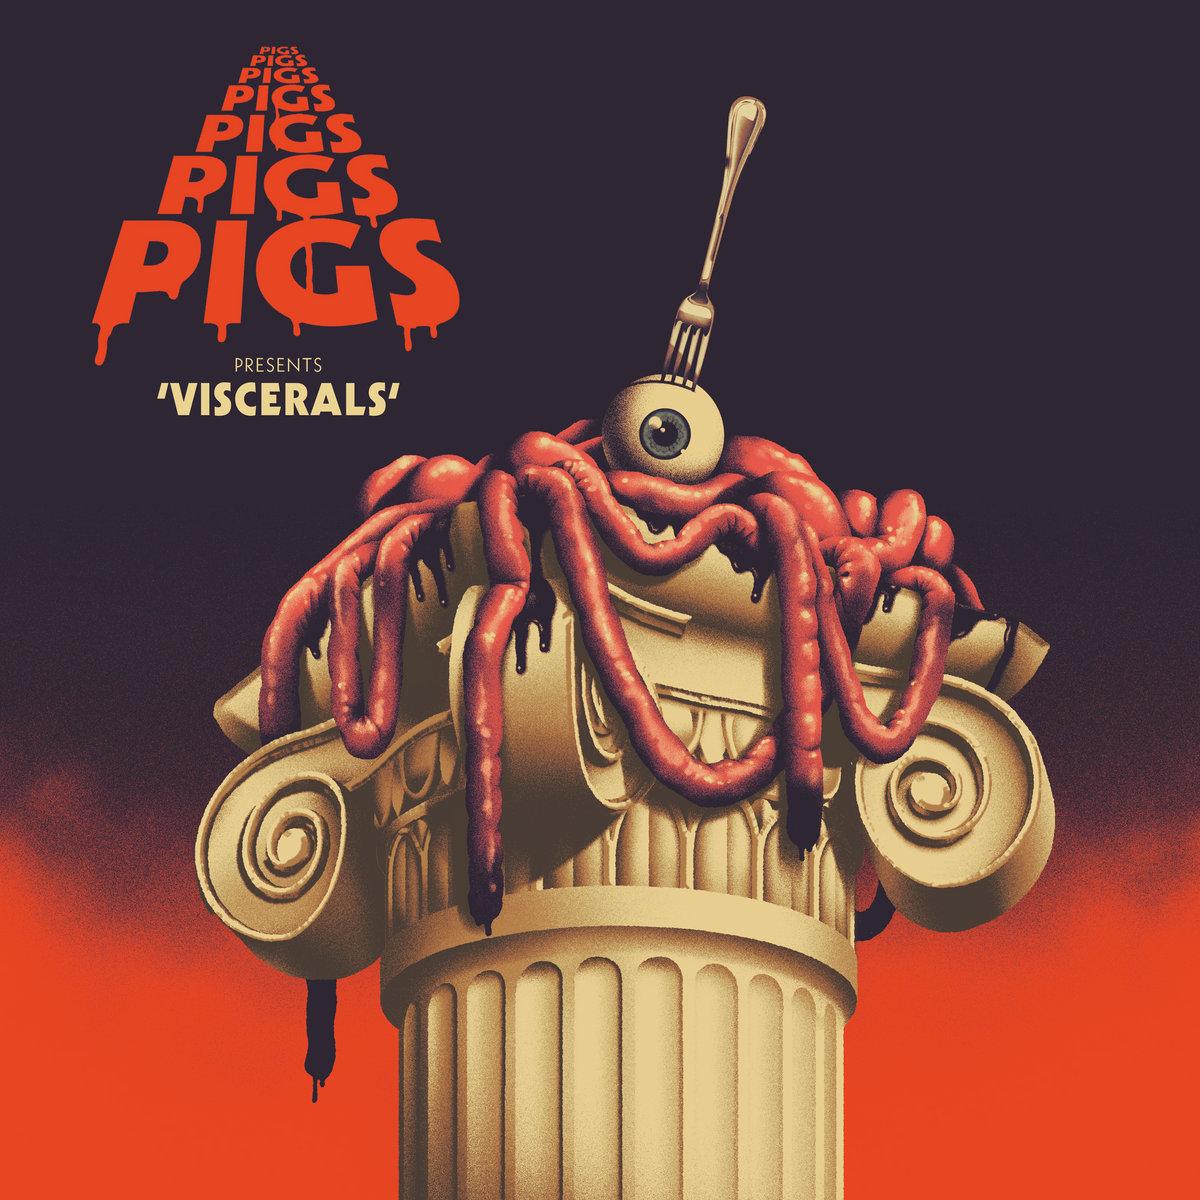 Viscerals - Pigsx7